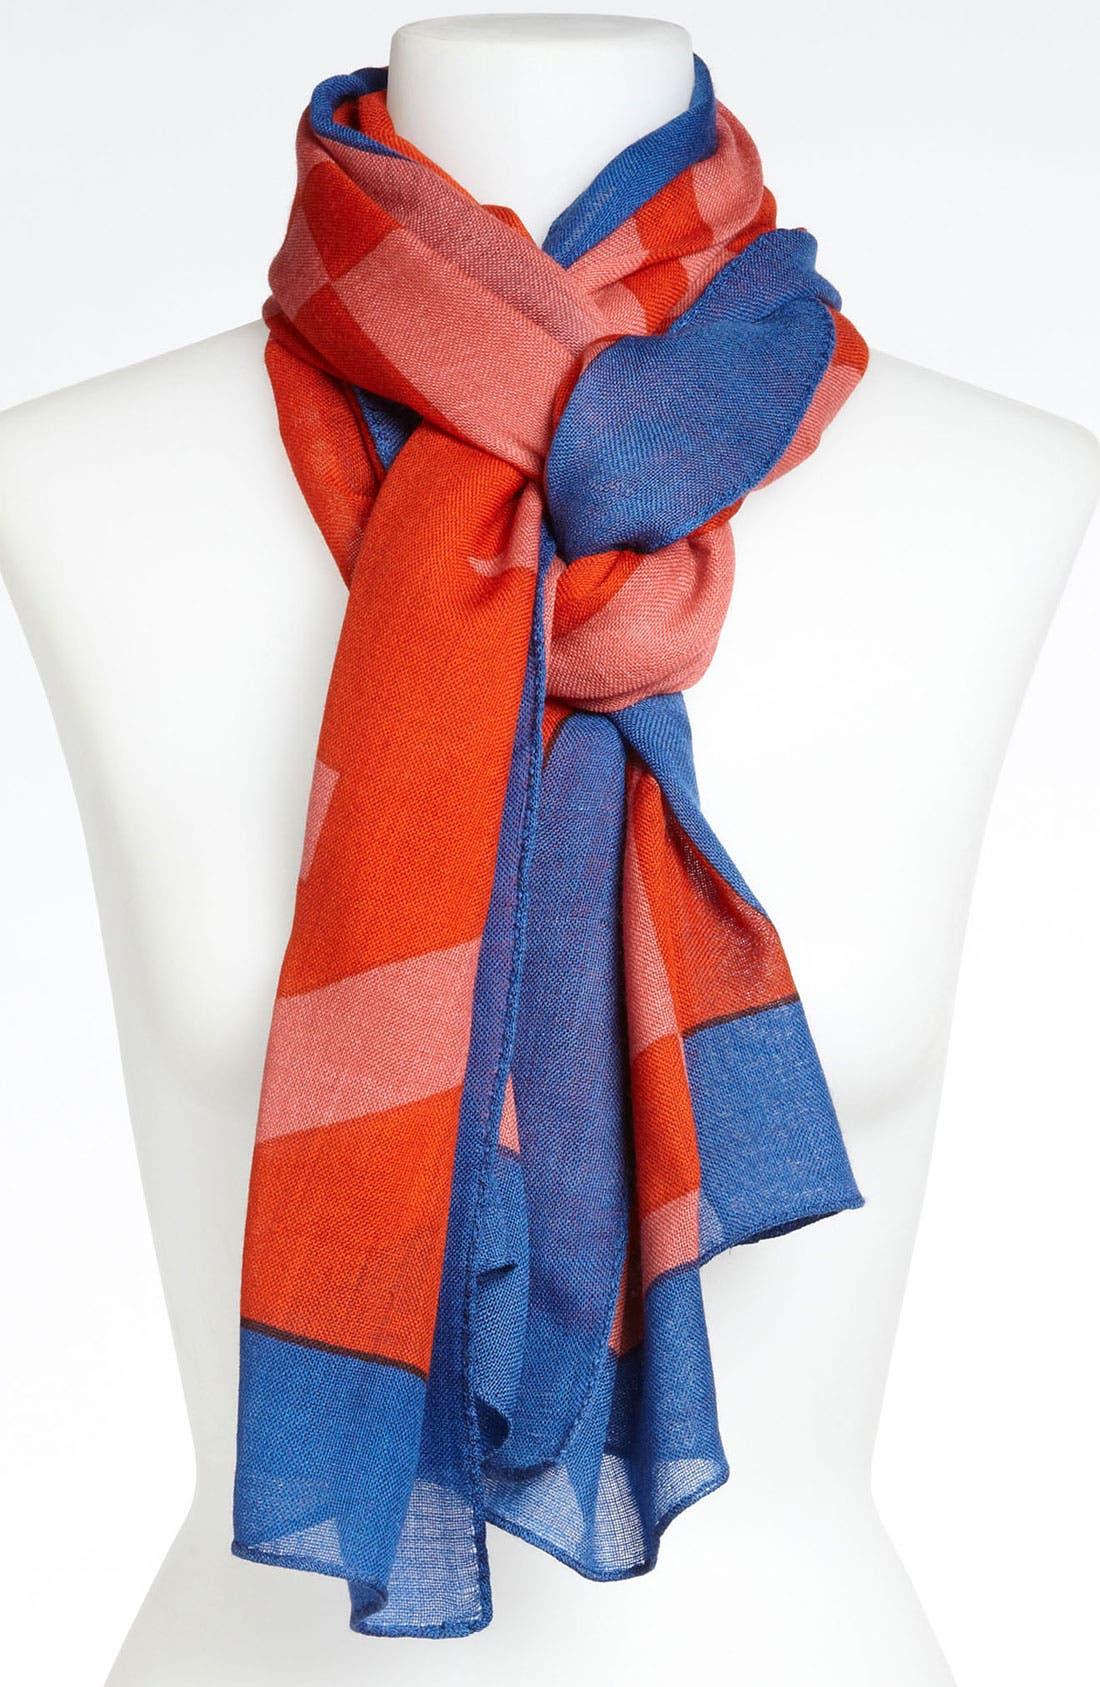 Alternate Image 1 Selected - Tory Burch 'Reva' Print Wool Scarf